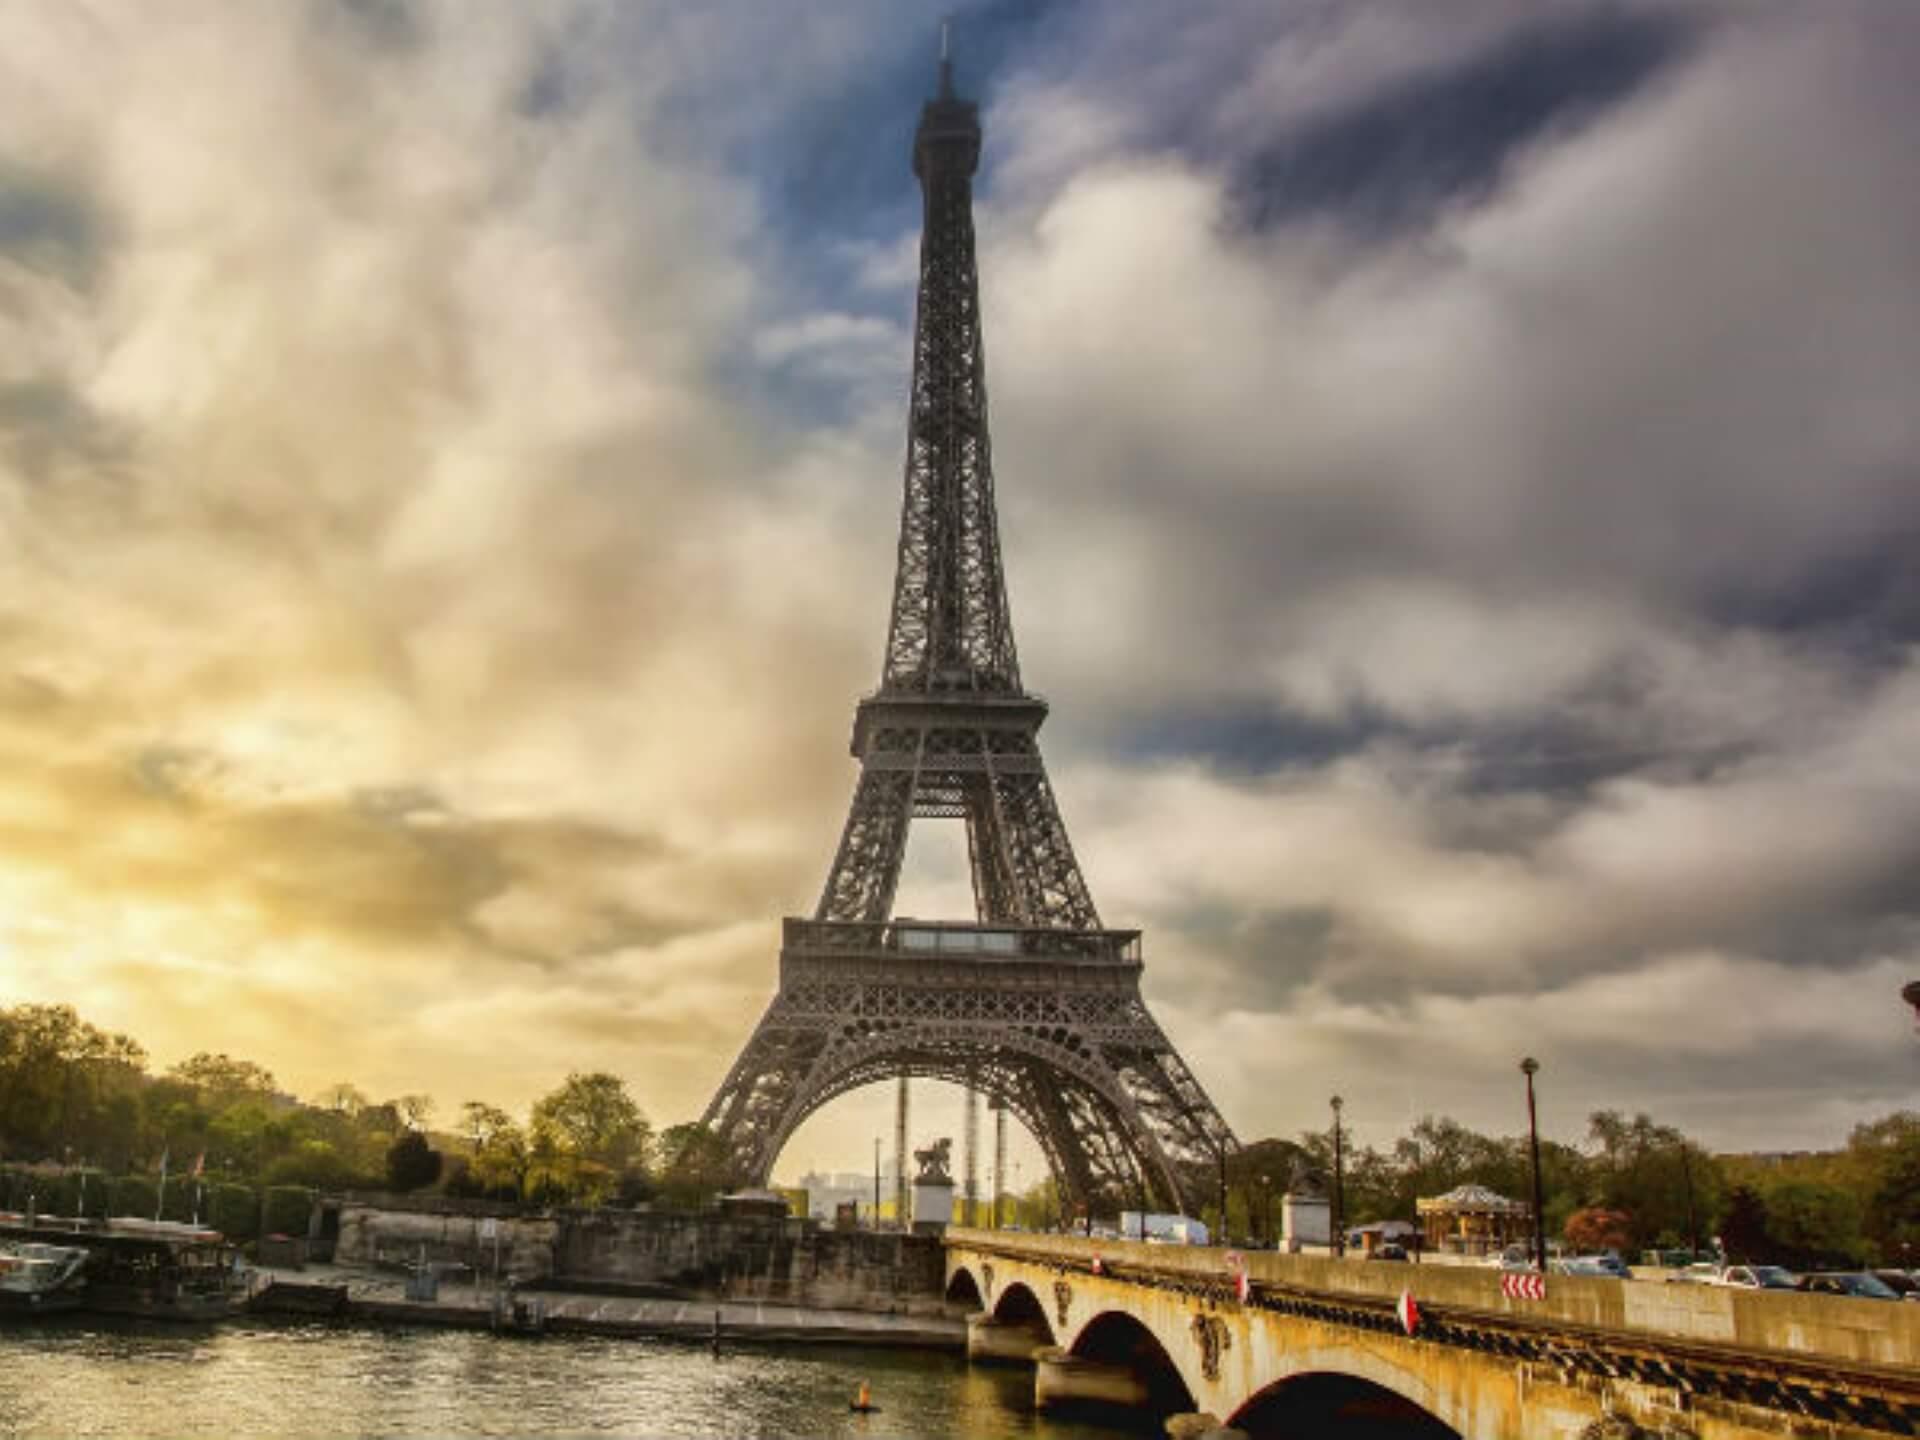 france Eiffel Tower in Paris France